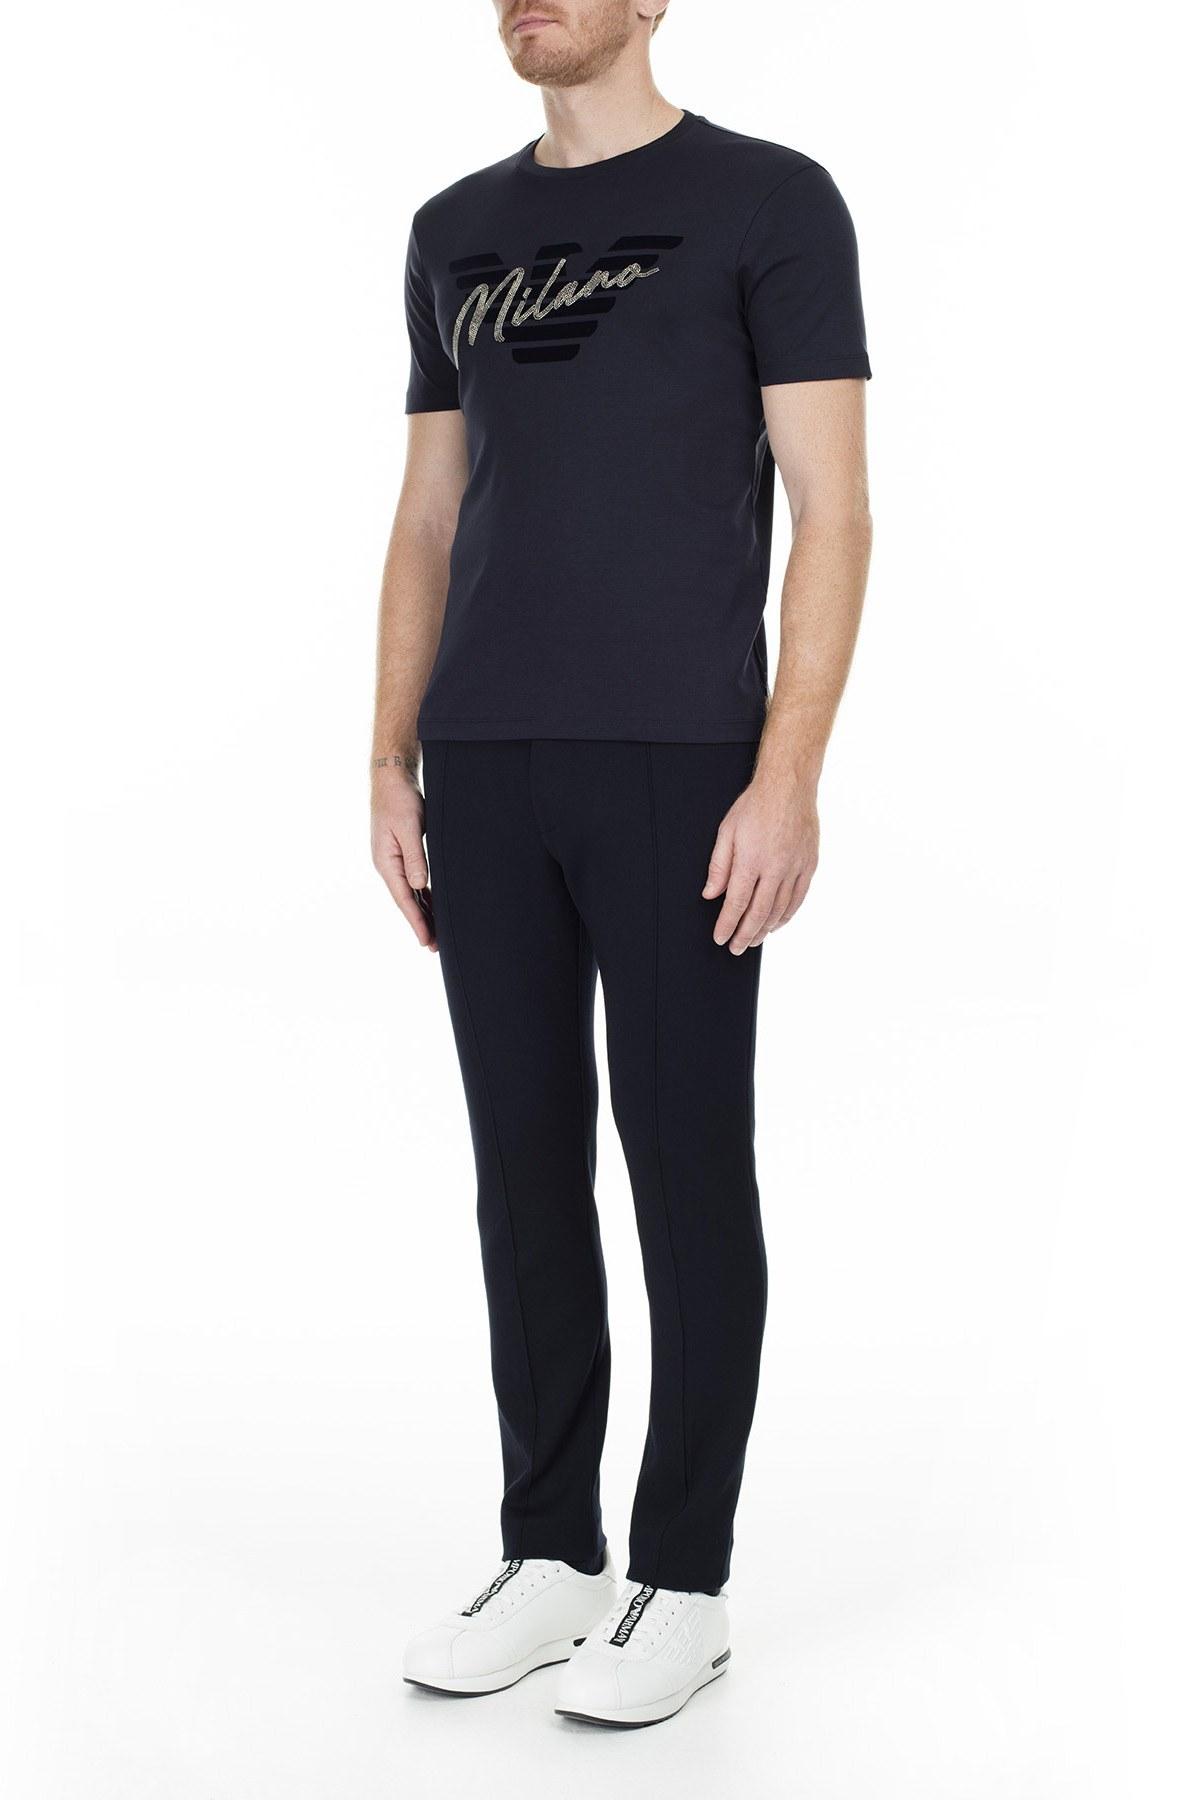 Emporio Armani Erkek T Shirt 6G1TF0 1JPRZ 0922 LACİVERT